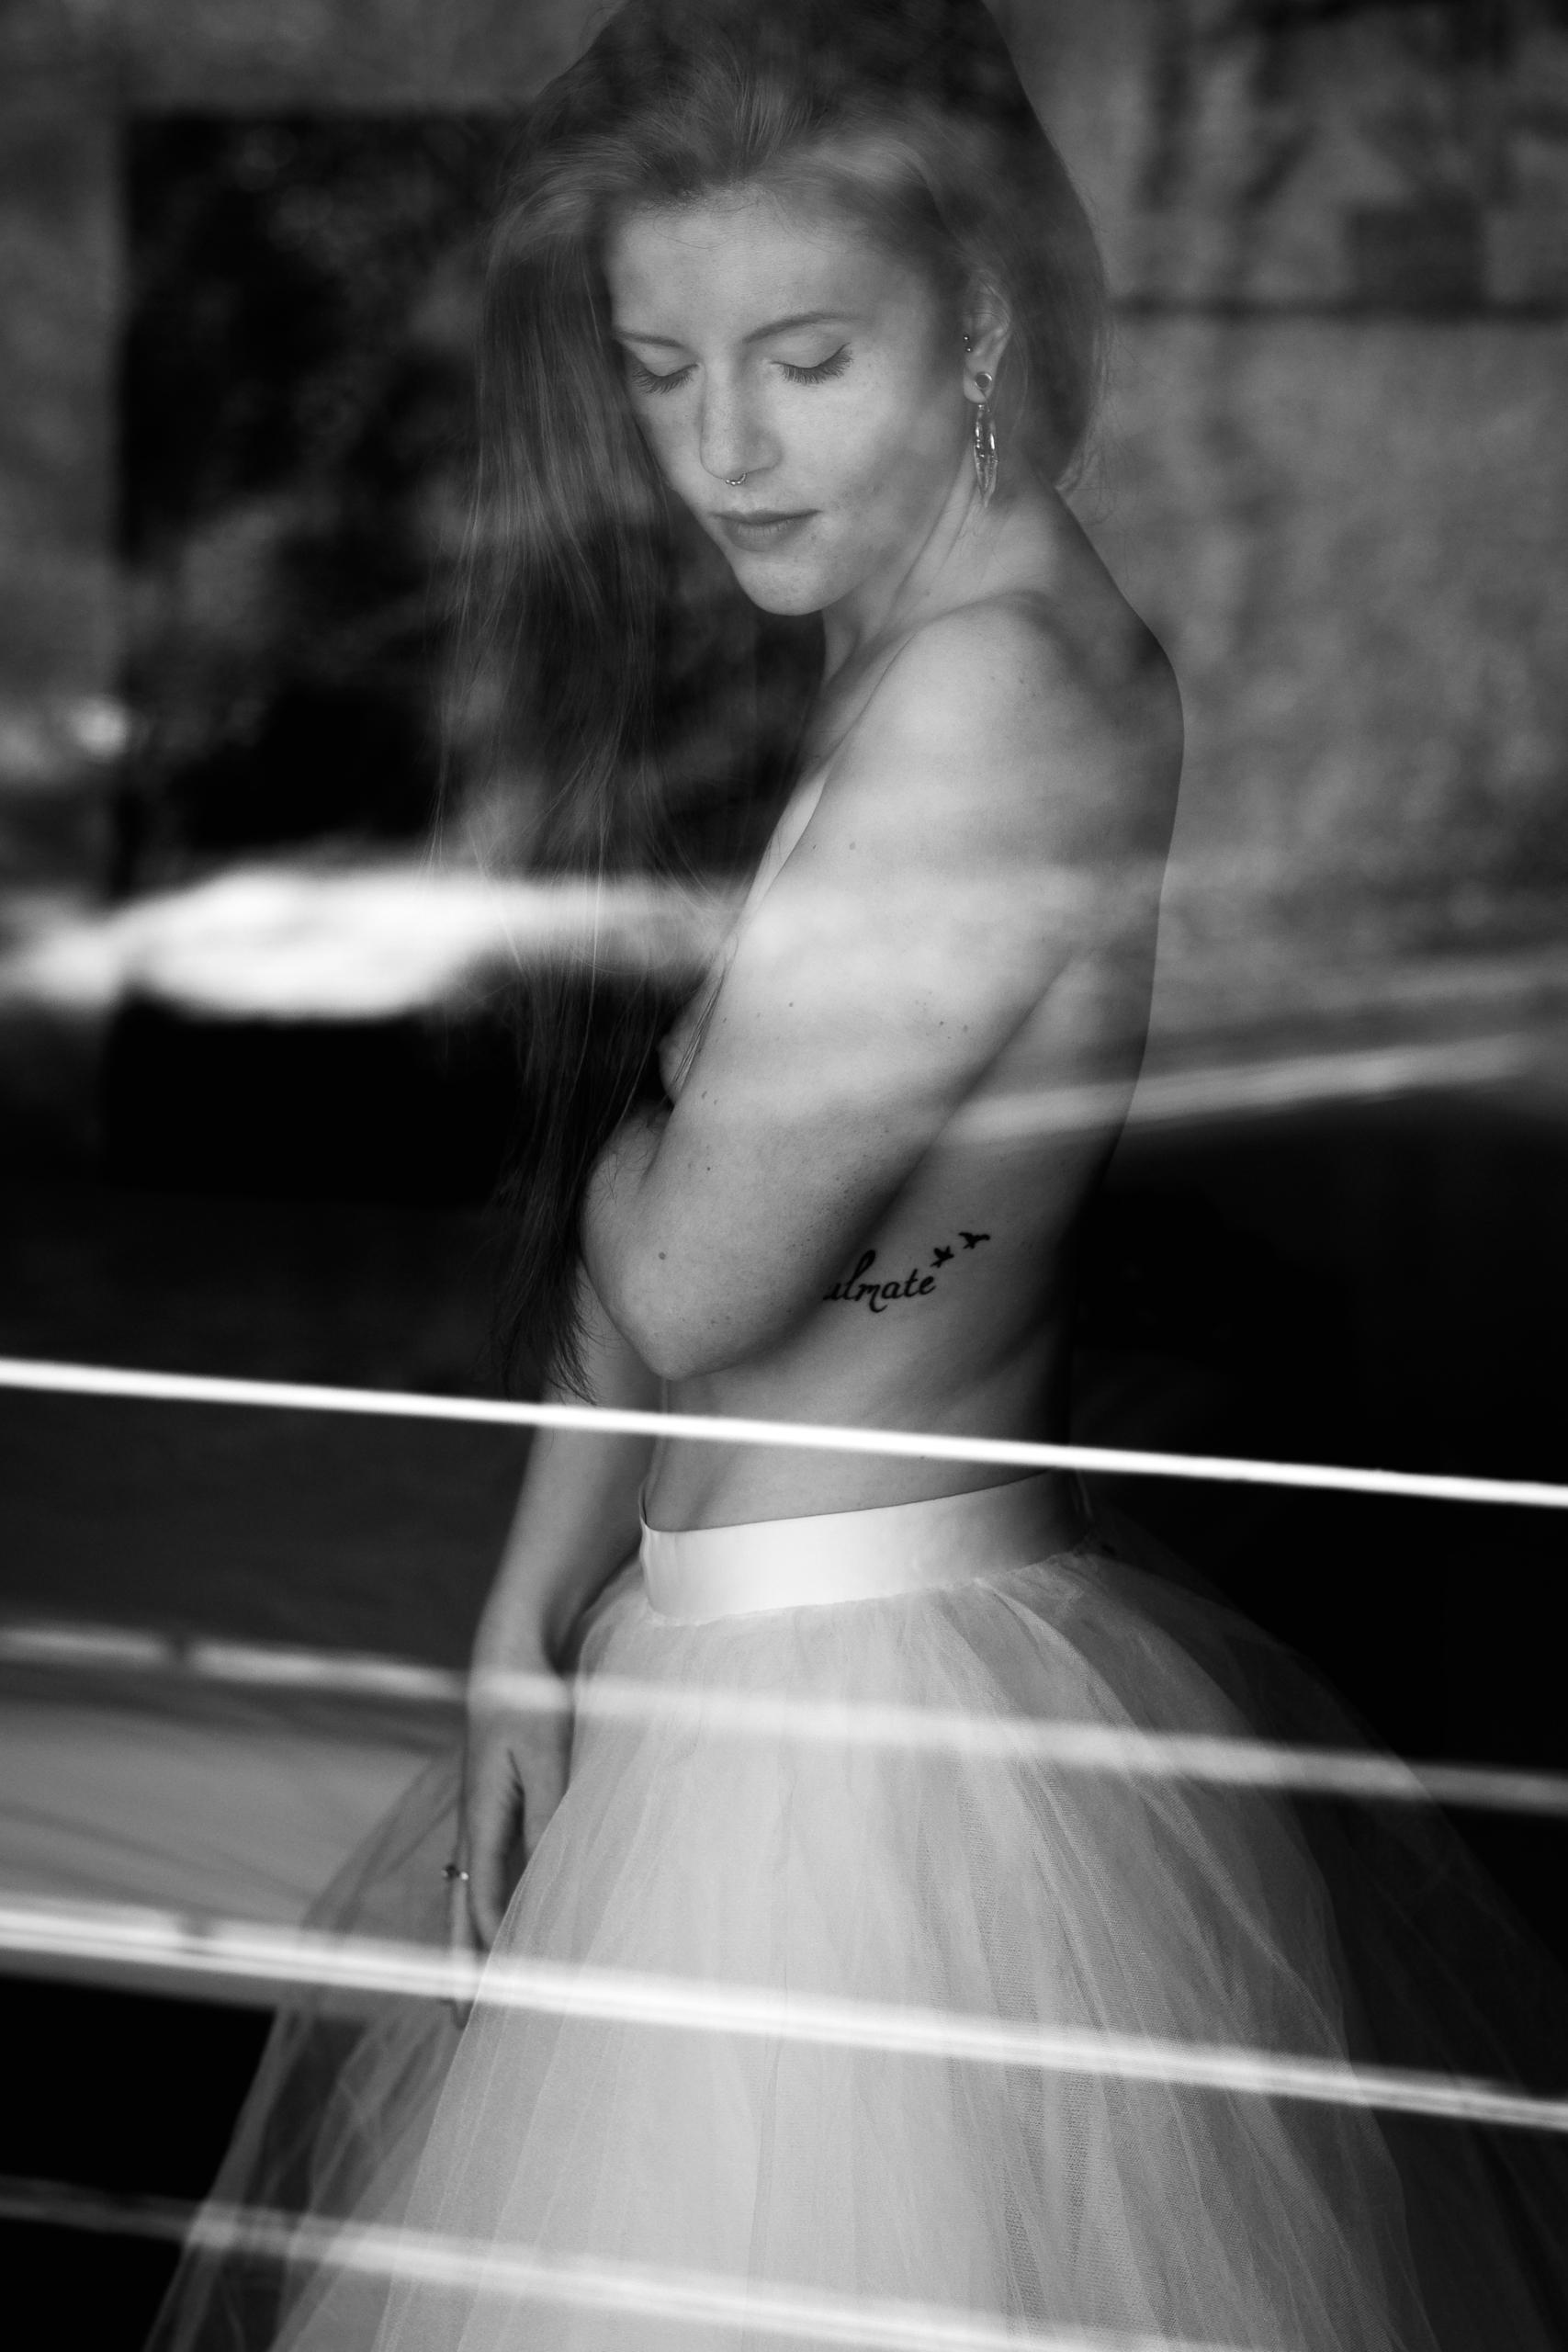 Reflecting reflections - girl, female - pixelhunter | ello